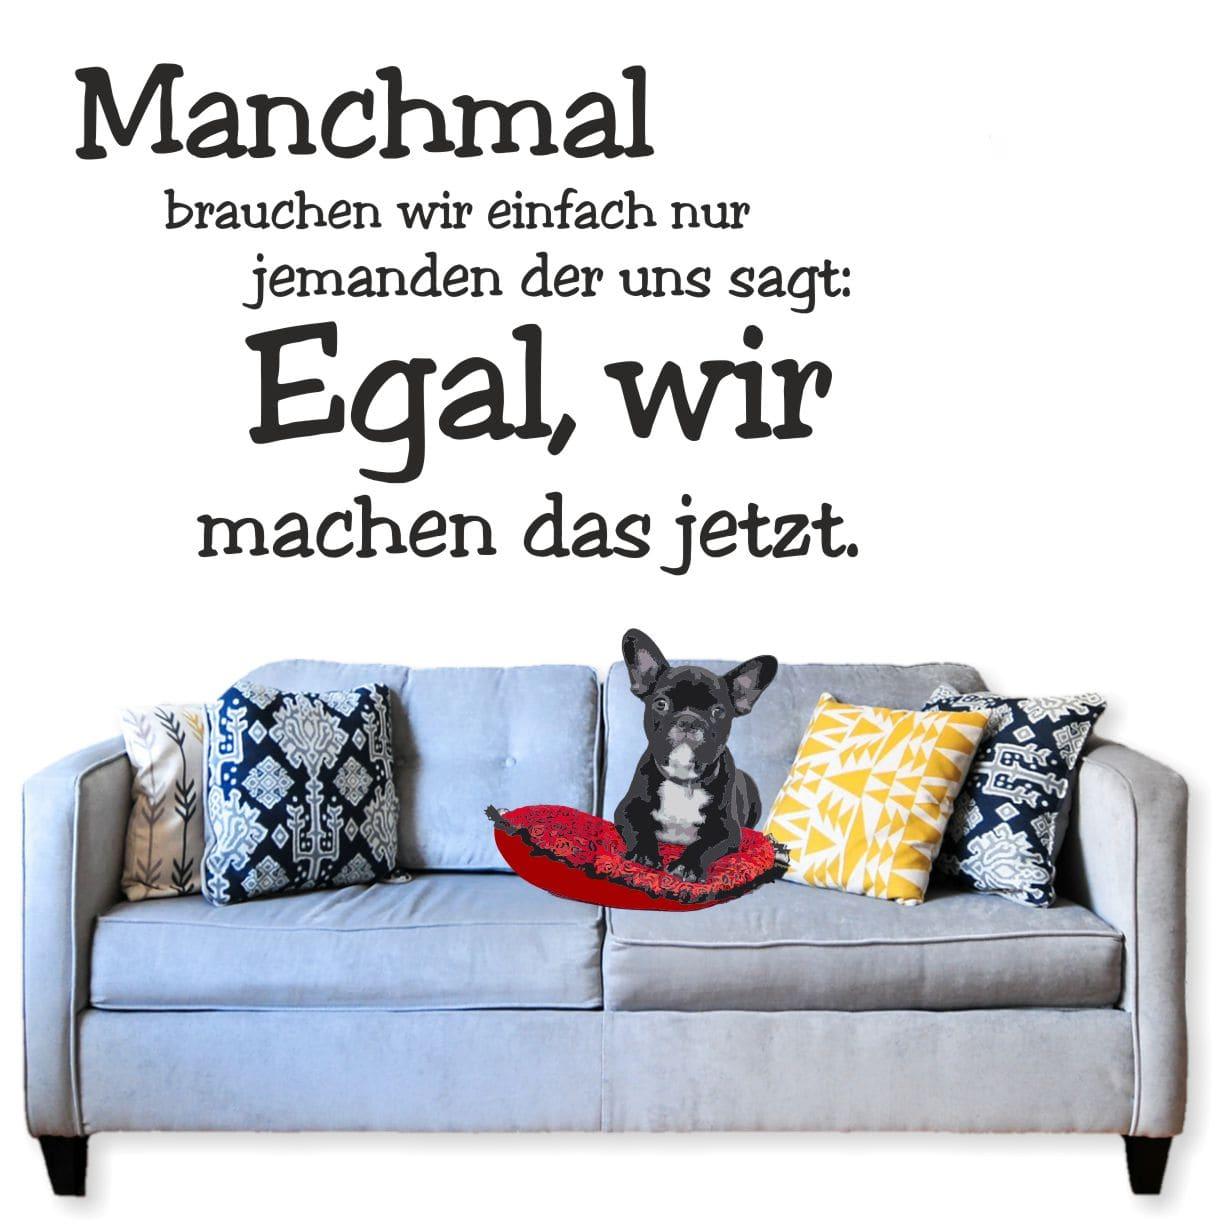 Full Size of Wandsprüche Familie Wandsprüche Wohnzimmer Wandsprüche Liebe Wandsprüche Für Die Küche Küche Wandsprüche